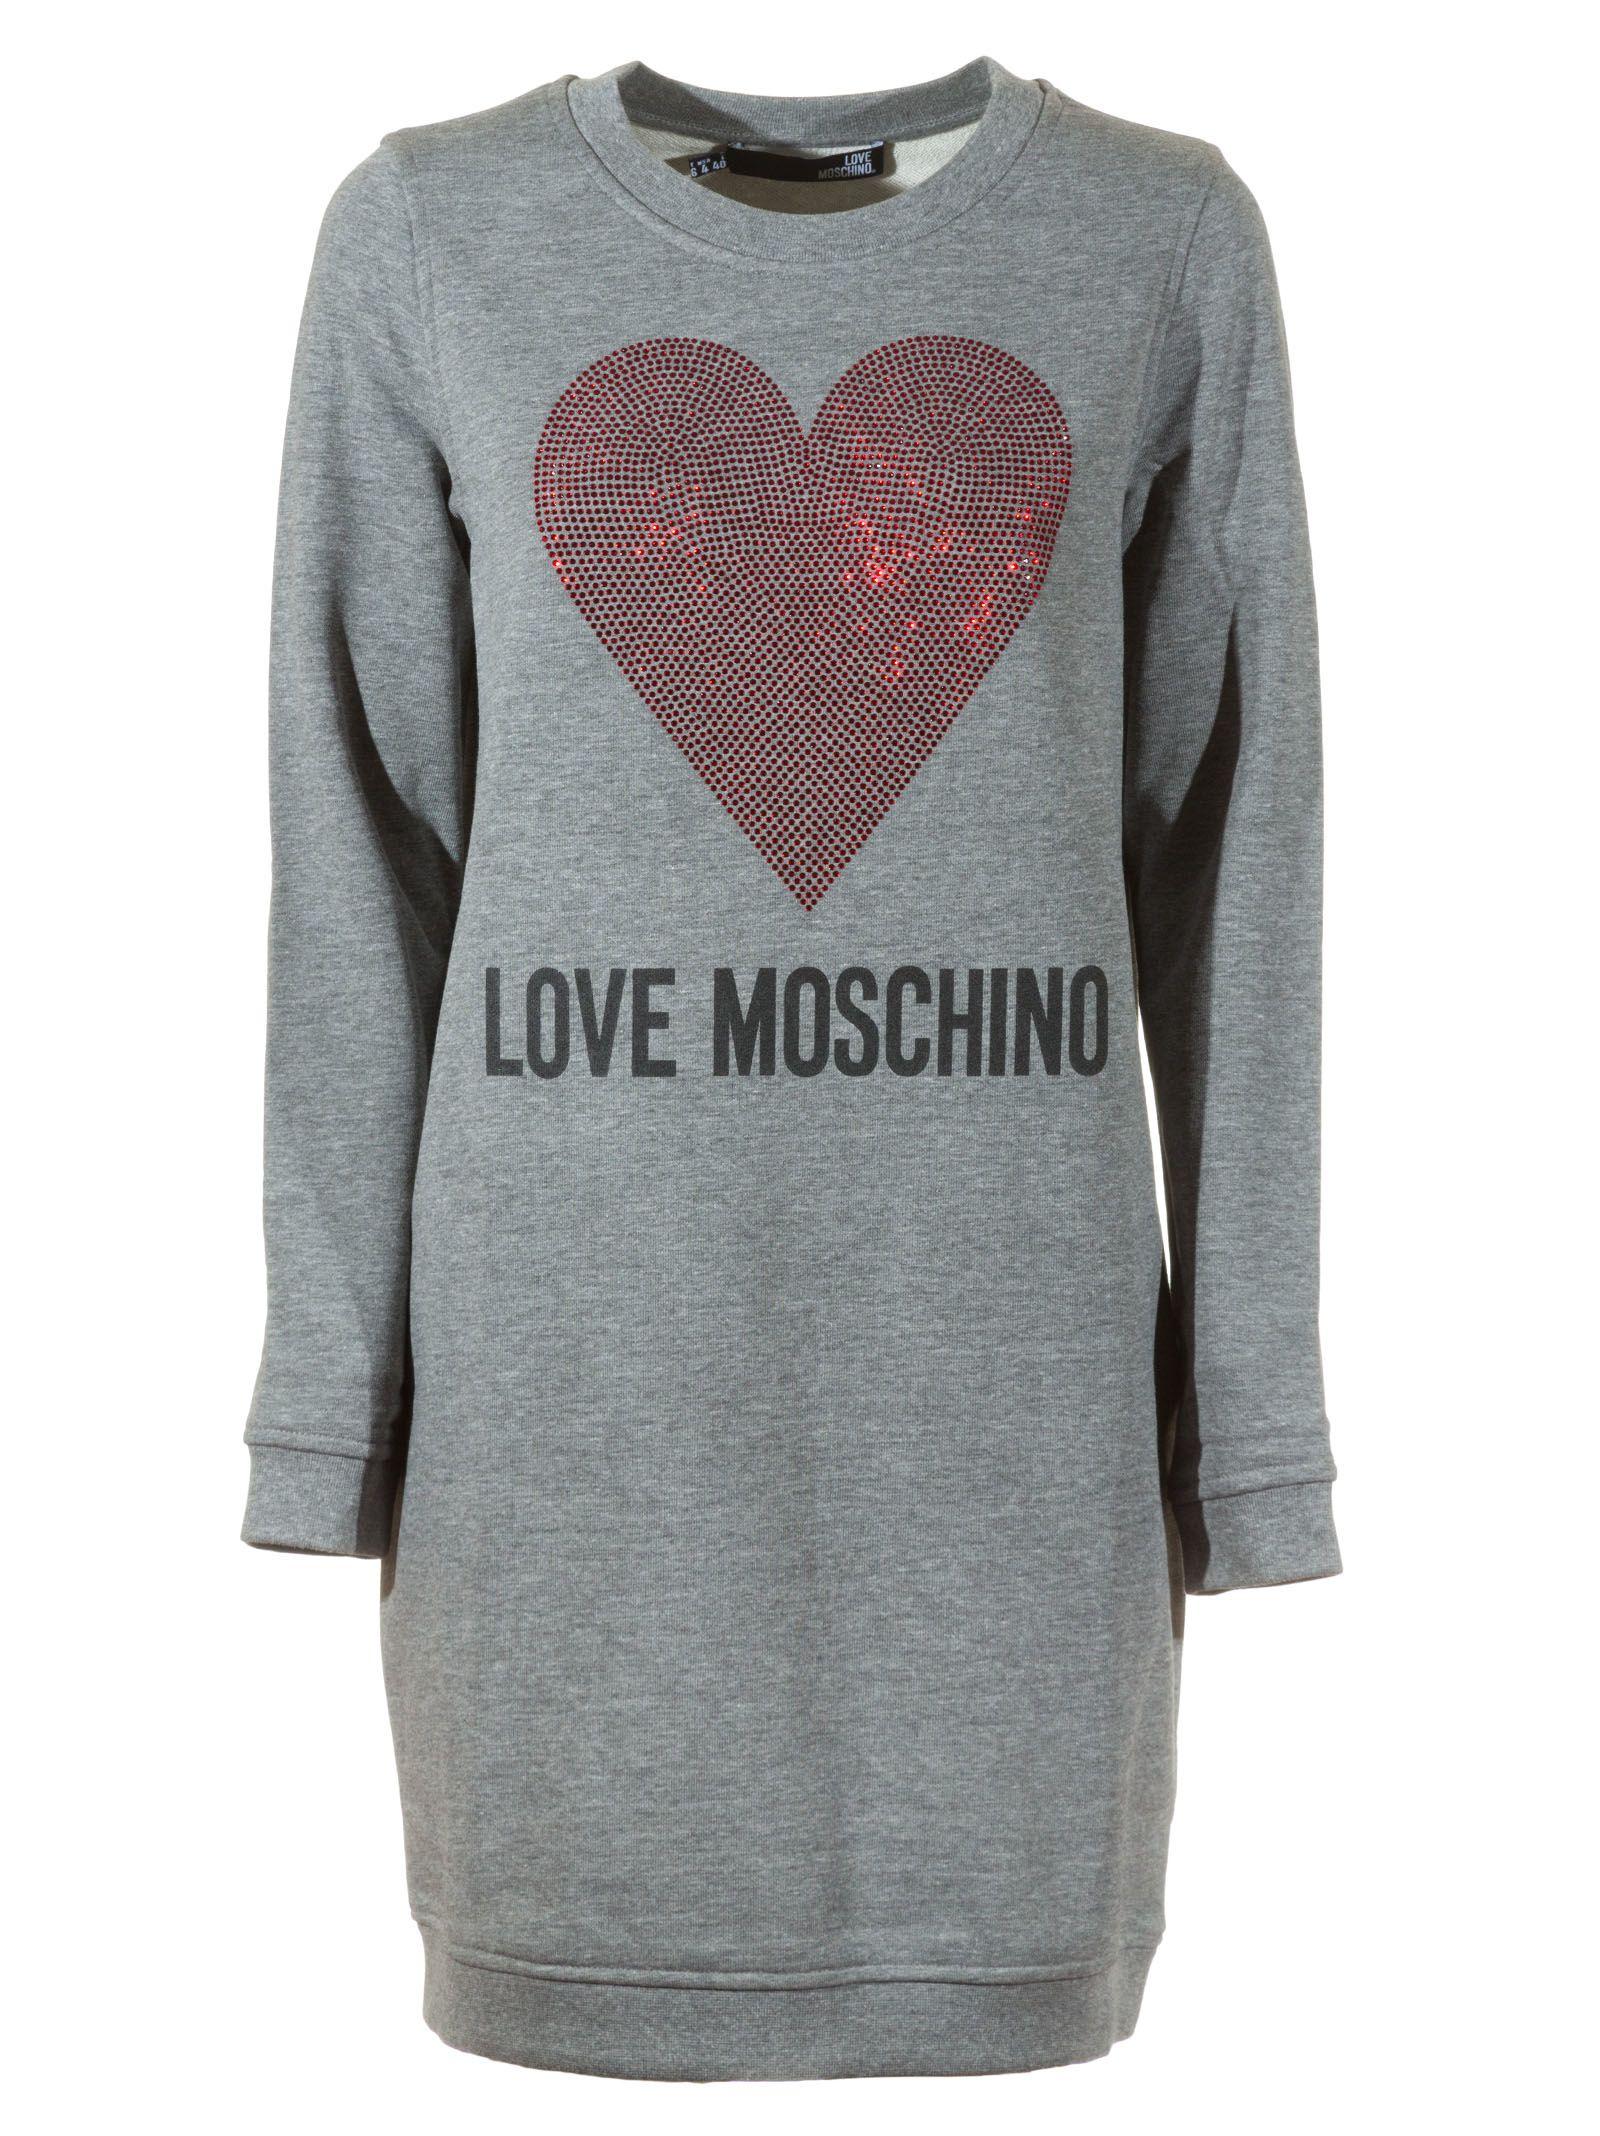 41649125905 Love Moschino Love Moschino Sequined Heart Sweater Dress - Grey ...